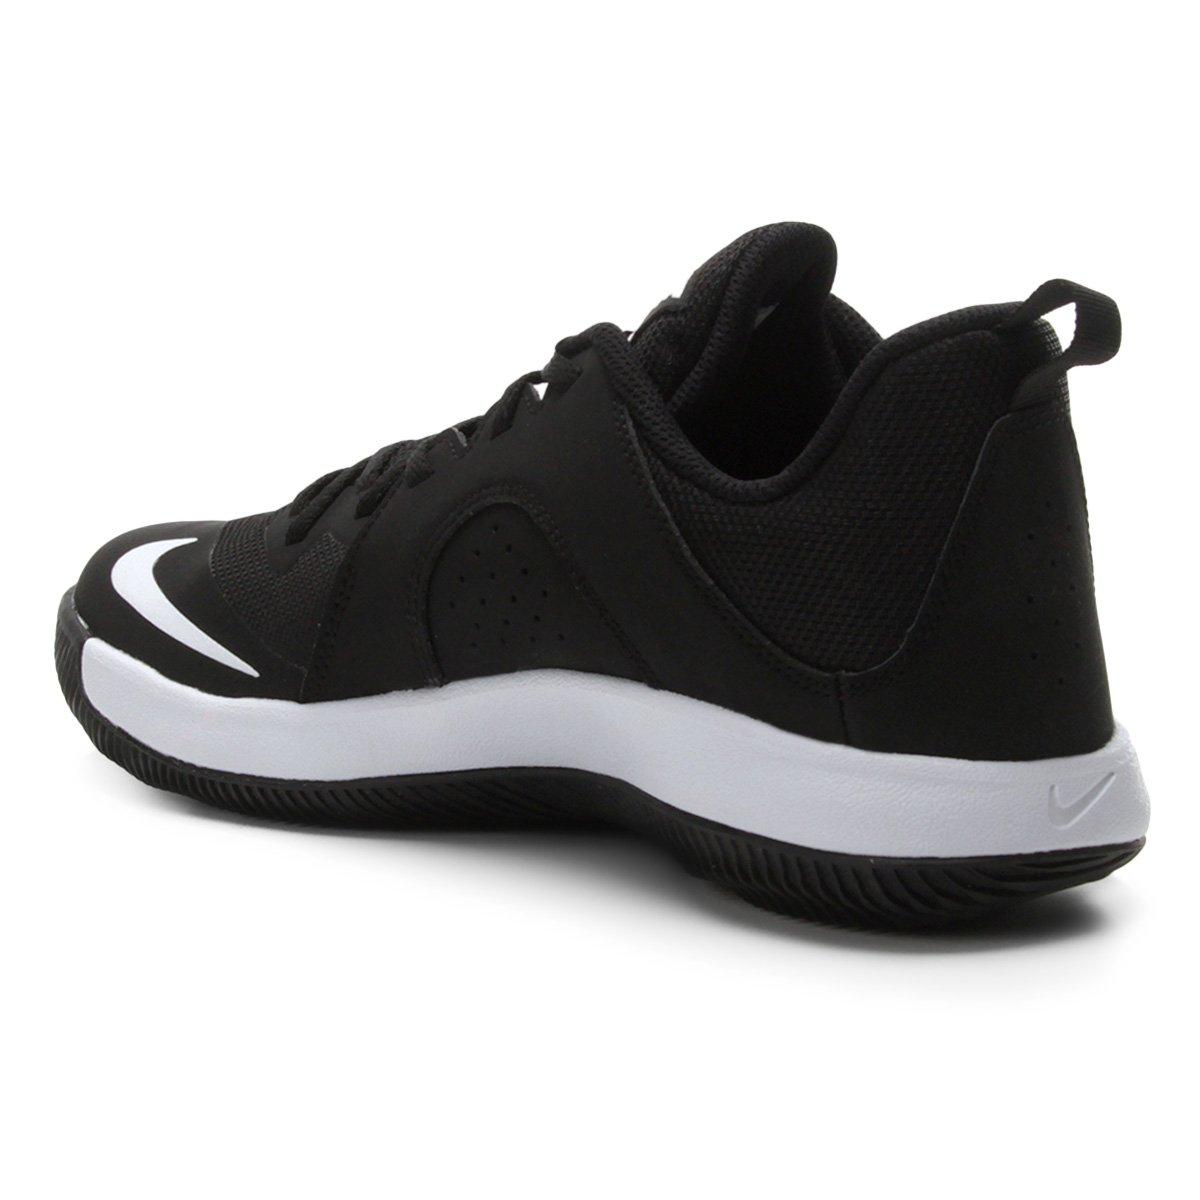 Tênis Nike Fly.By Low Masculino - Preto e Branco - Compre Agora ... e294c98e92731